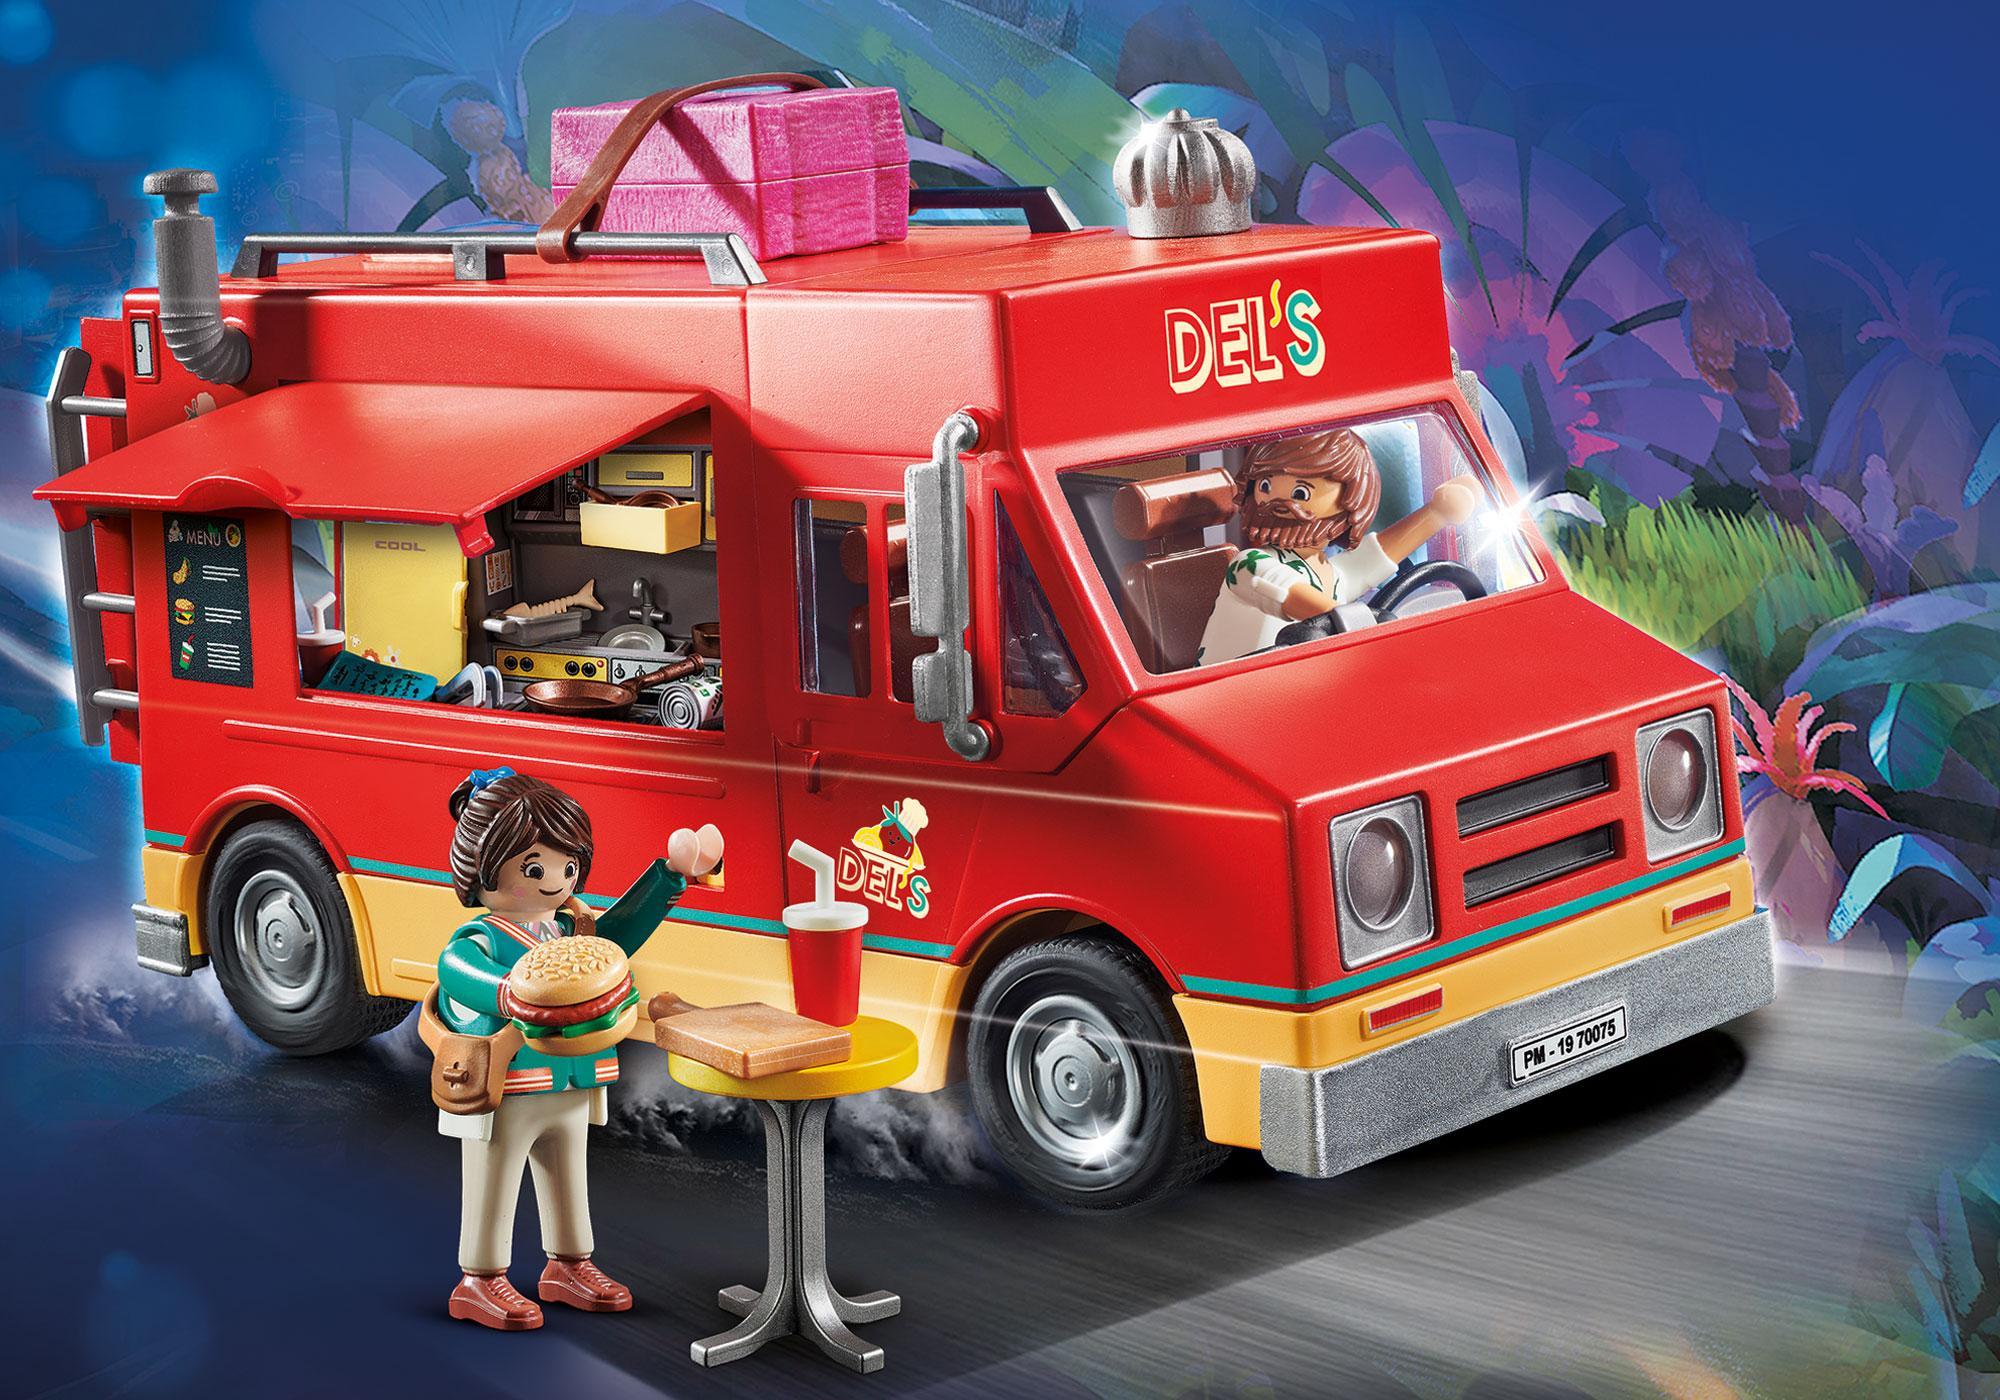 http://media.playmobil.com/i/playmobil/70075_product_detail/PLAYMOBIL: THE MOVIE Food Truck de Del